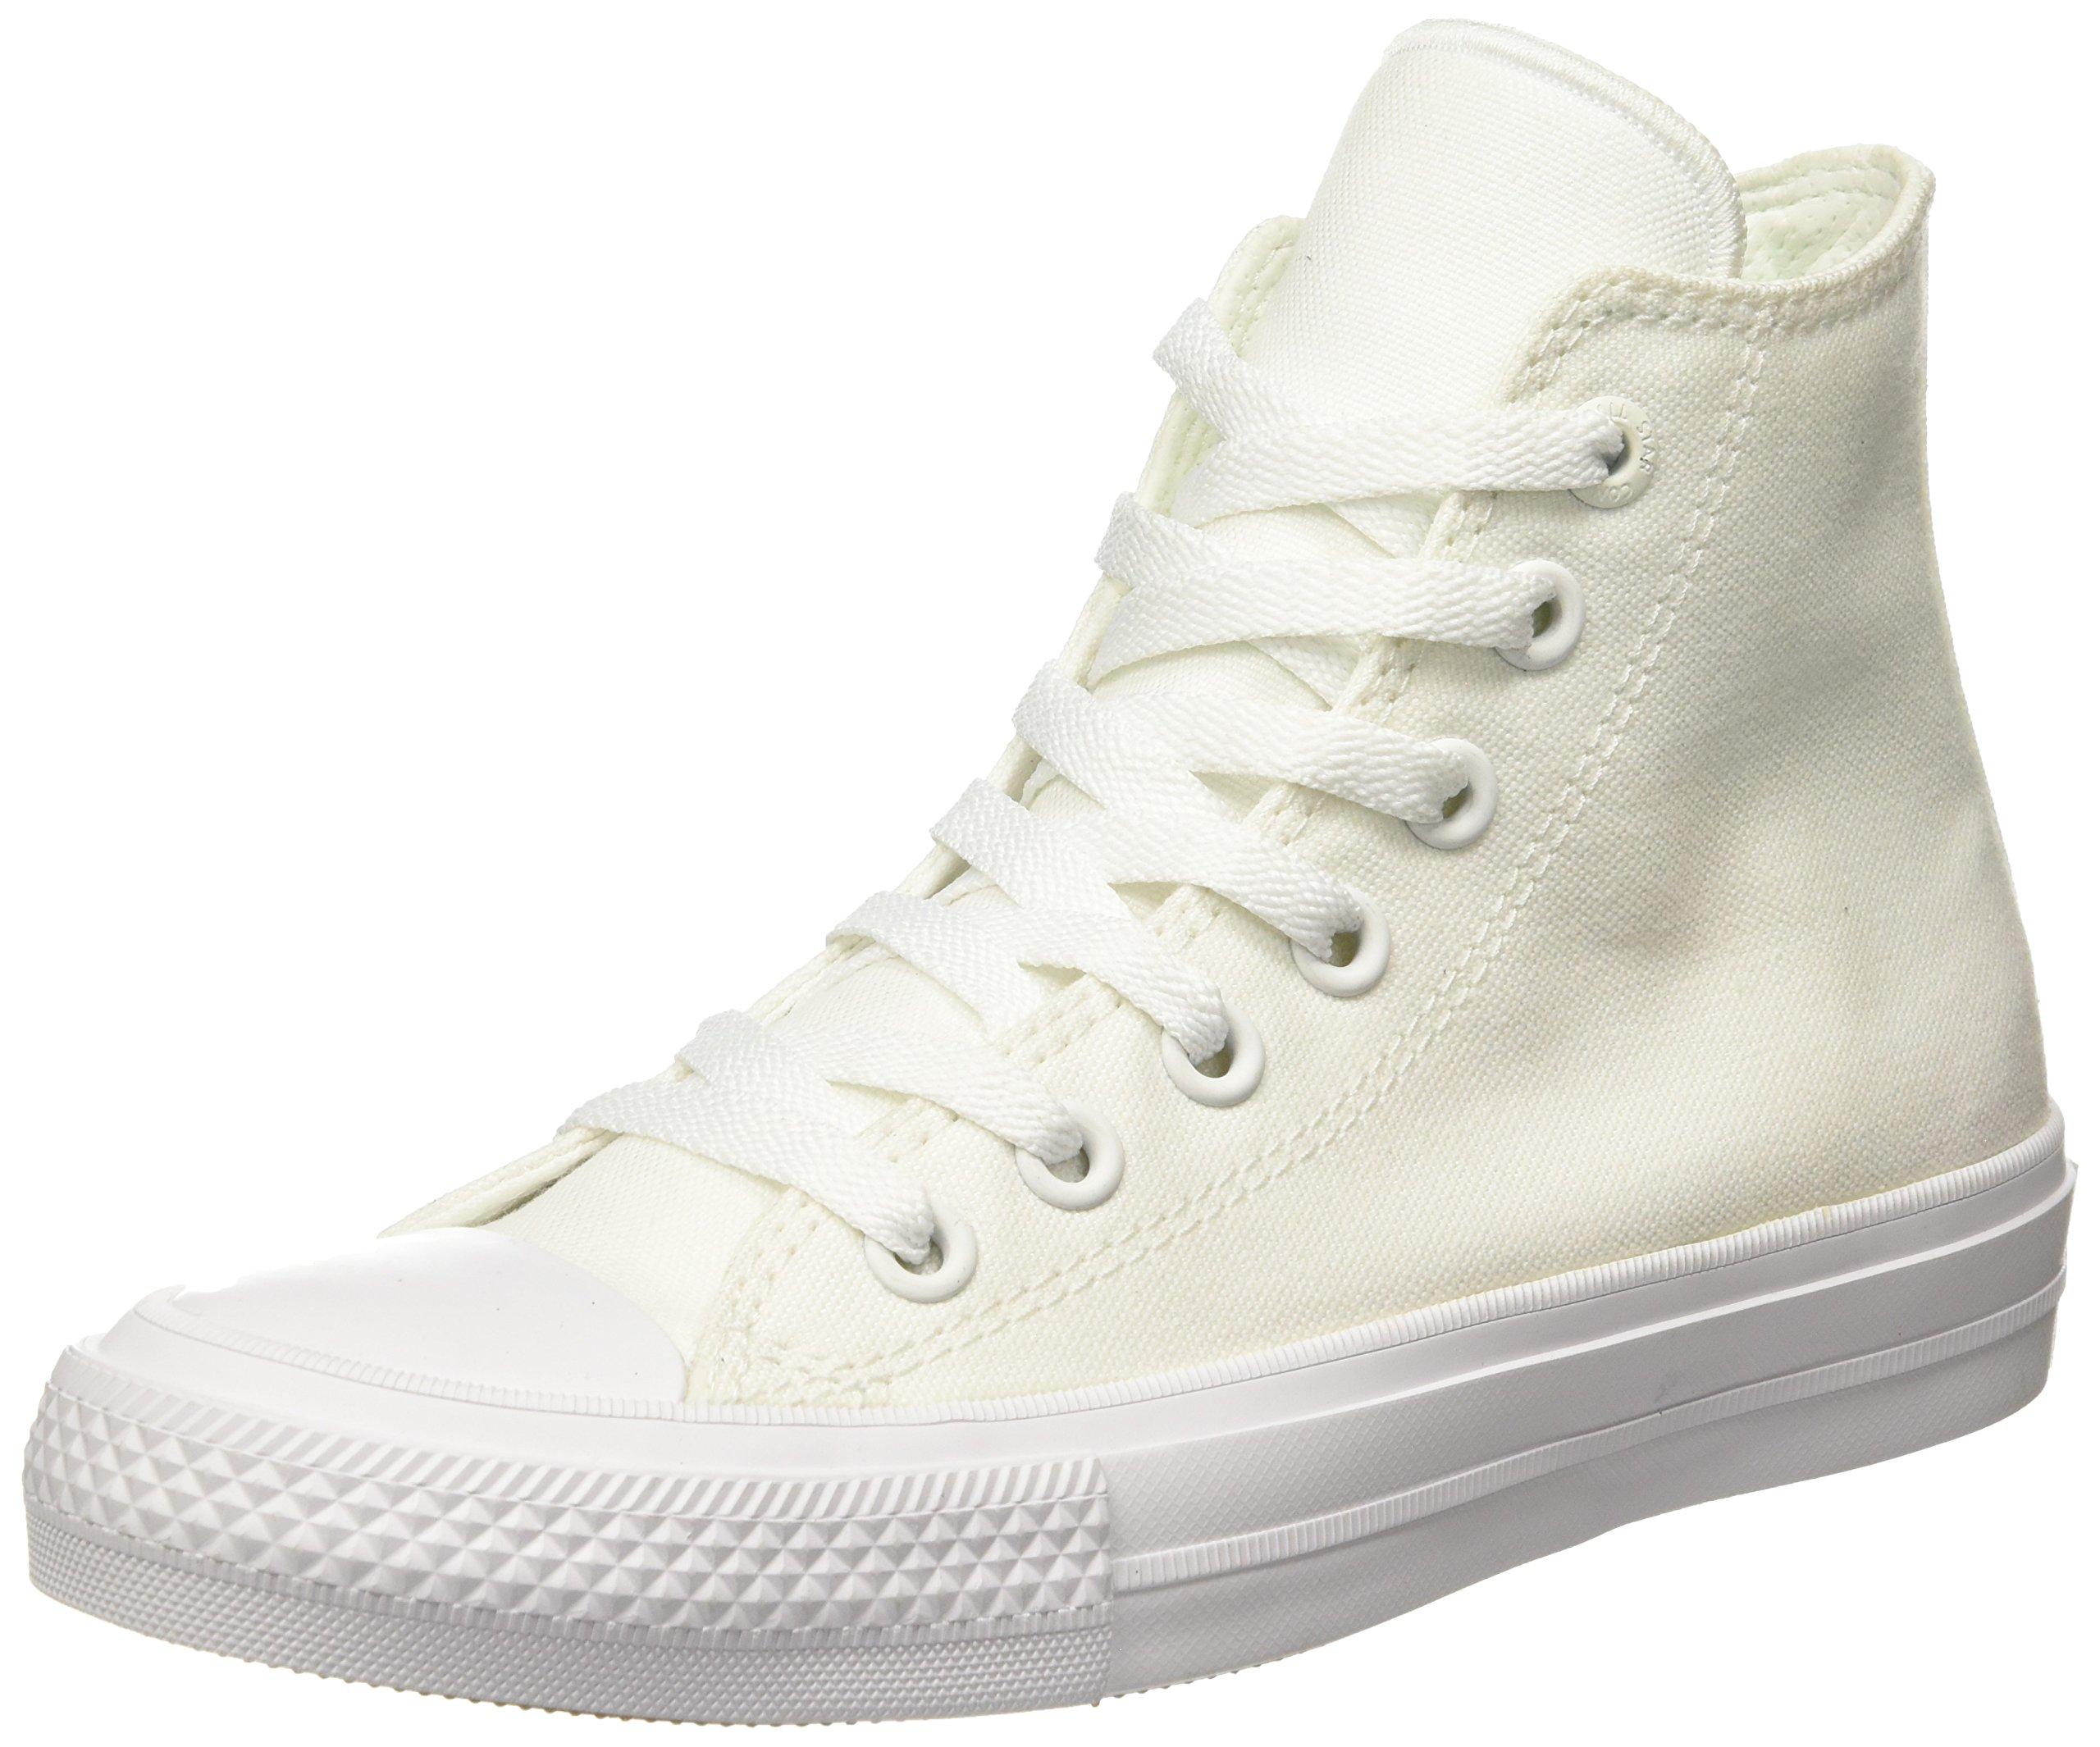 White Eu Converse HommeBlanc Ct 5 Ii HiSneakers navy36 TlF1JcK